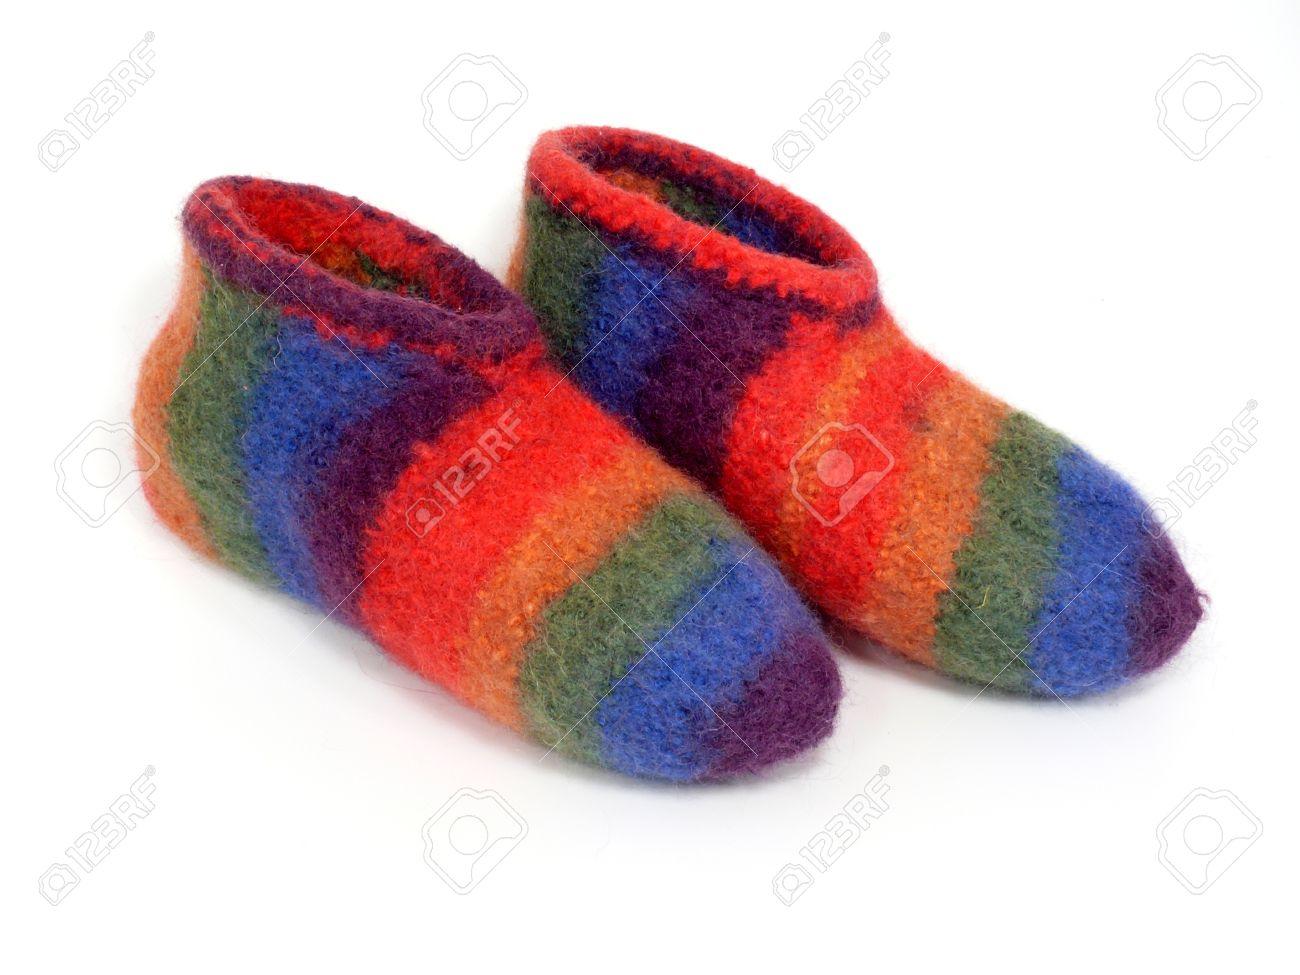 Knitting Grandma Slippers : Grandmas handmade felt slippers stock photo picture and royalty